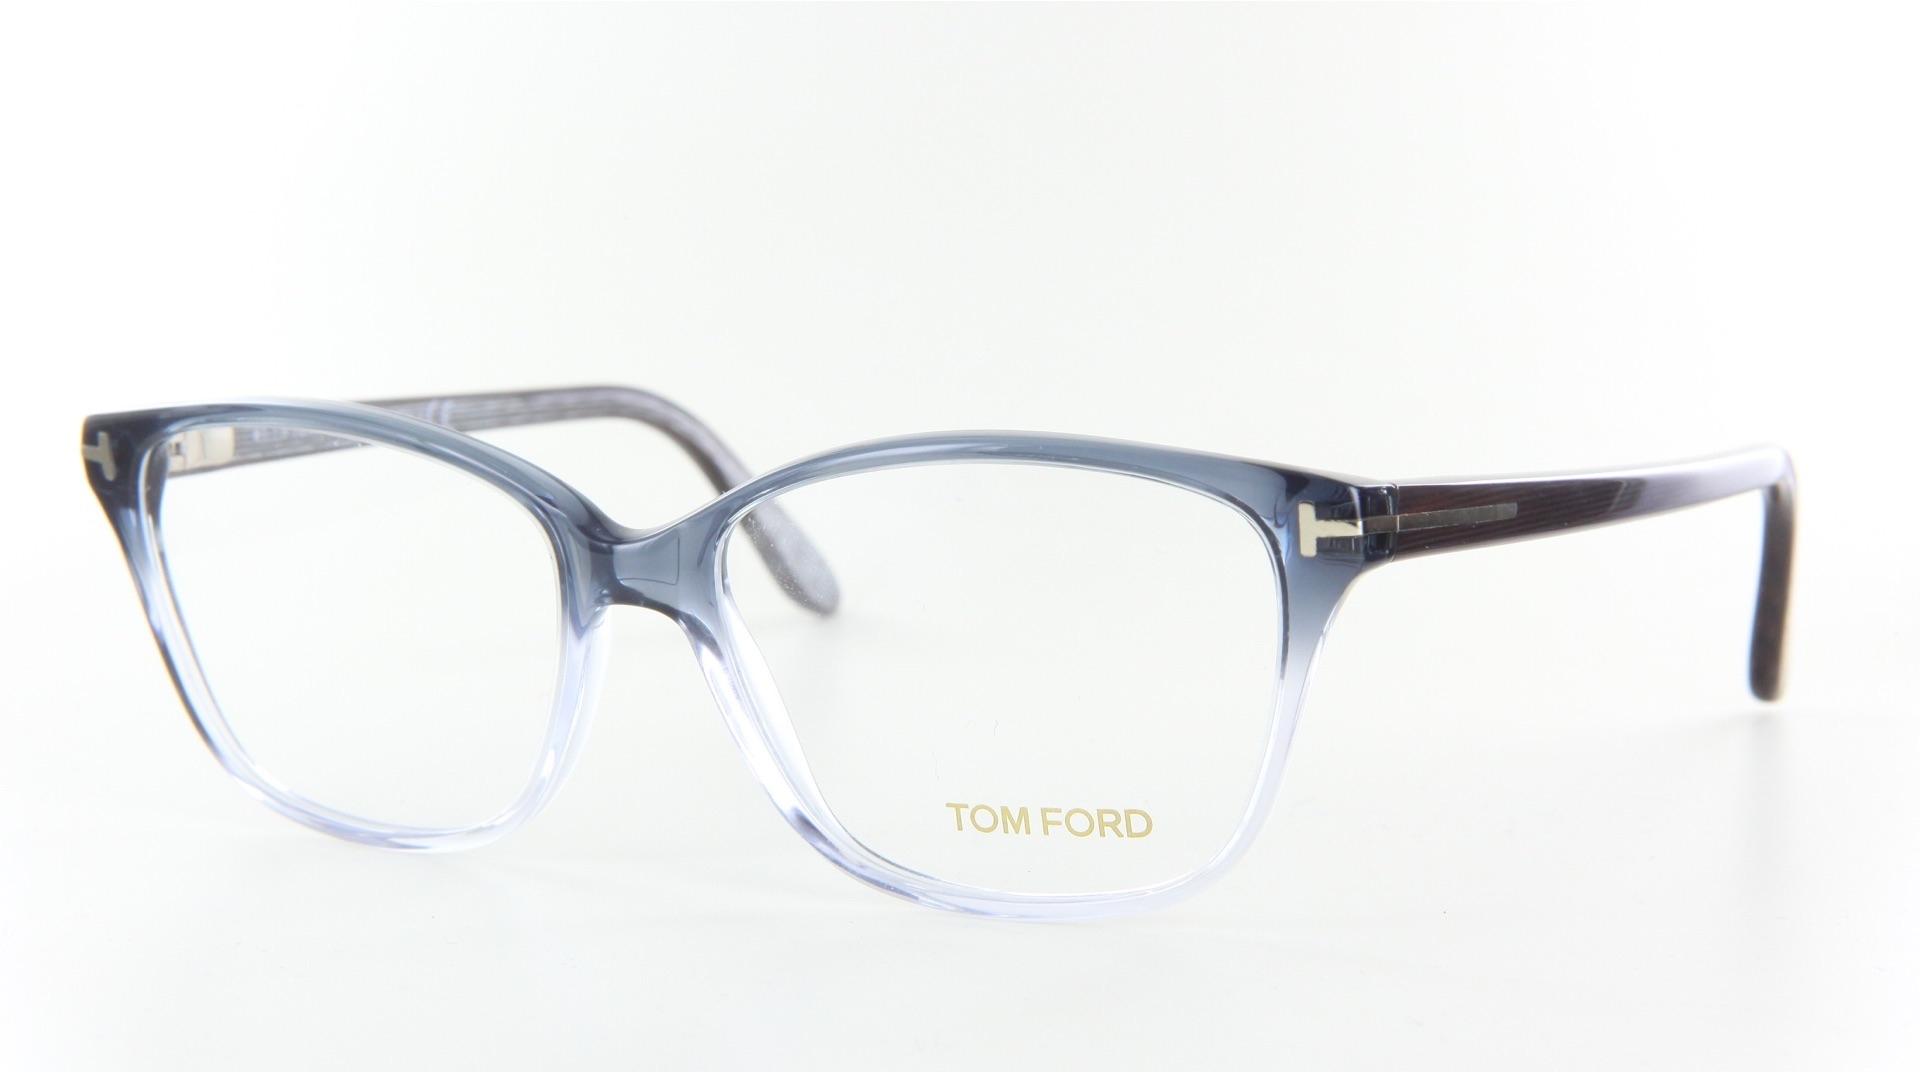 Tom Ford - ref: 75319